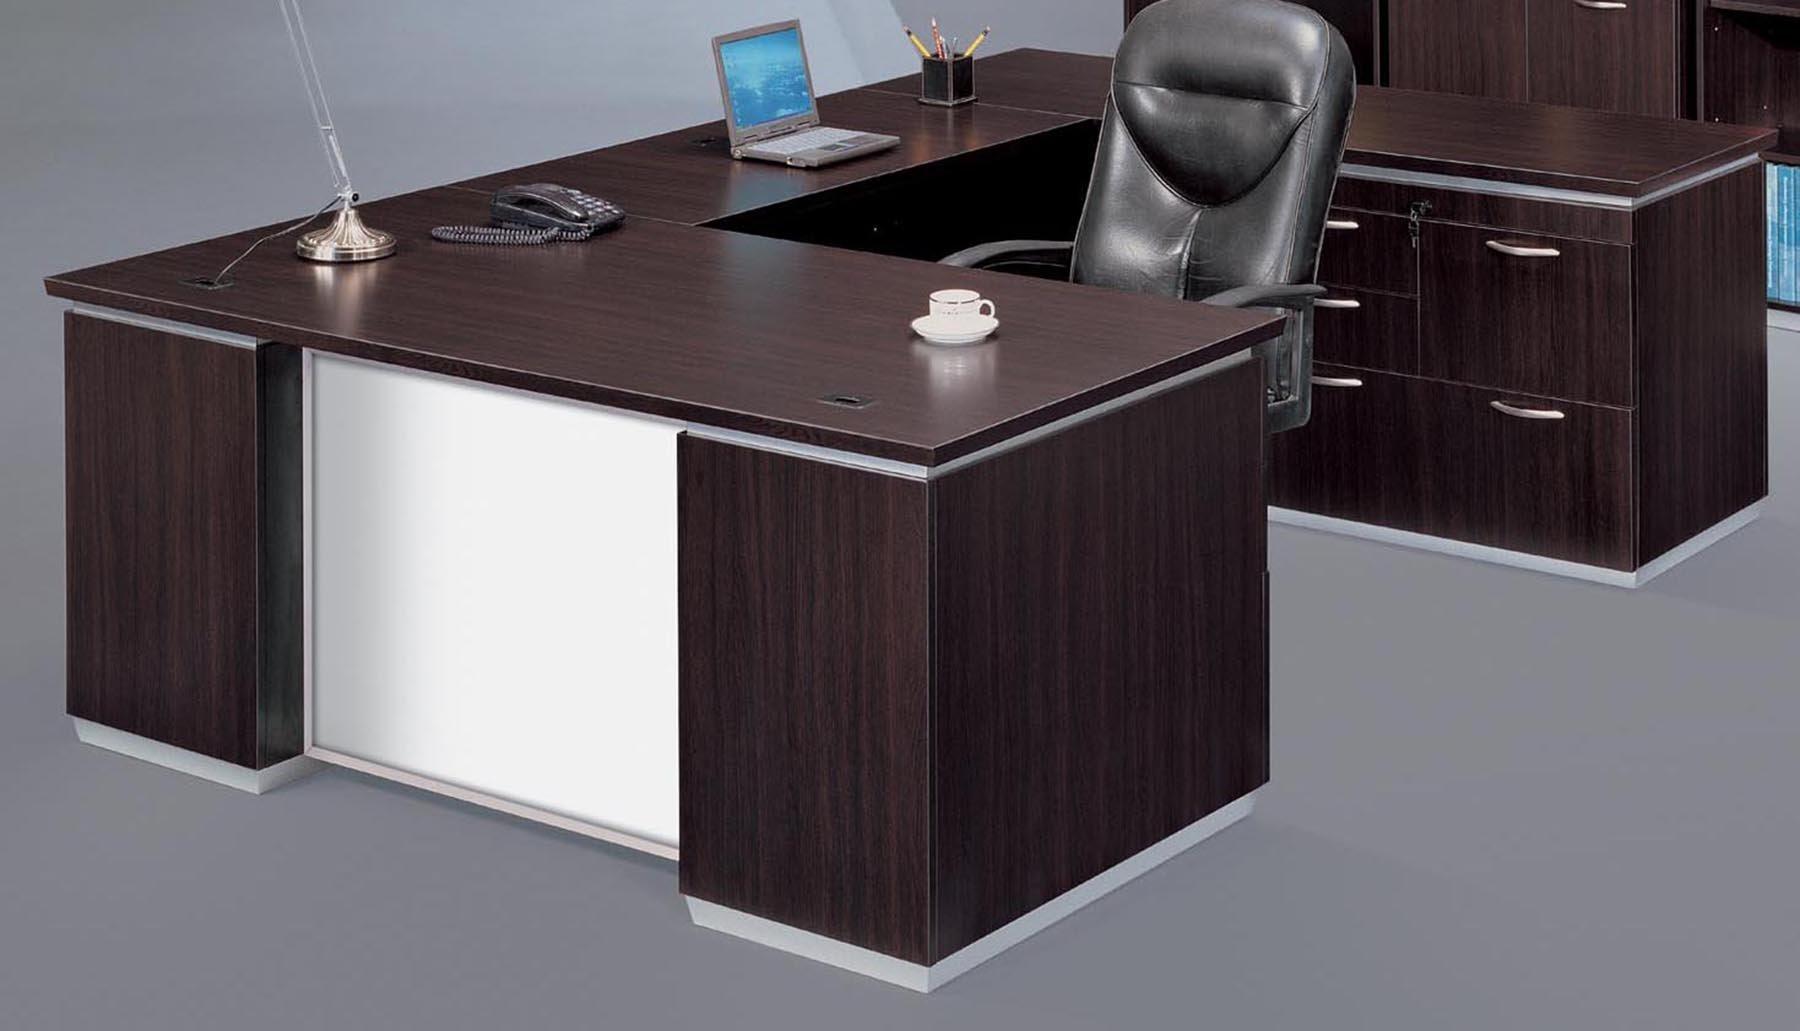 Flexsteel Pimlico  Right Personal File U Desk with White Glass Modesty Panel